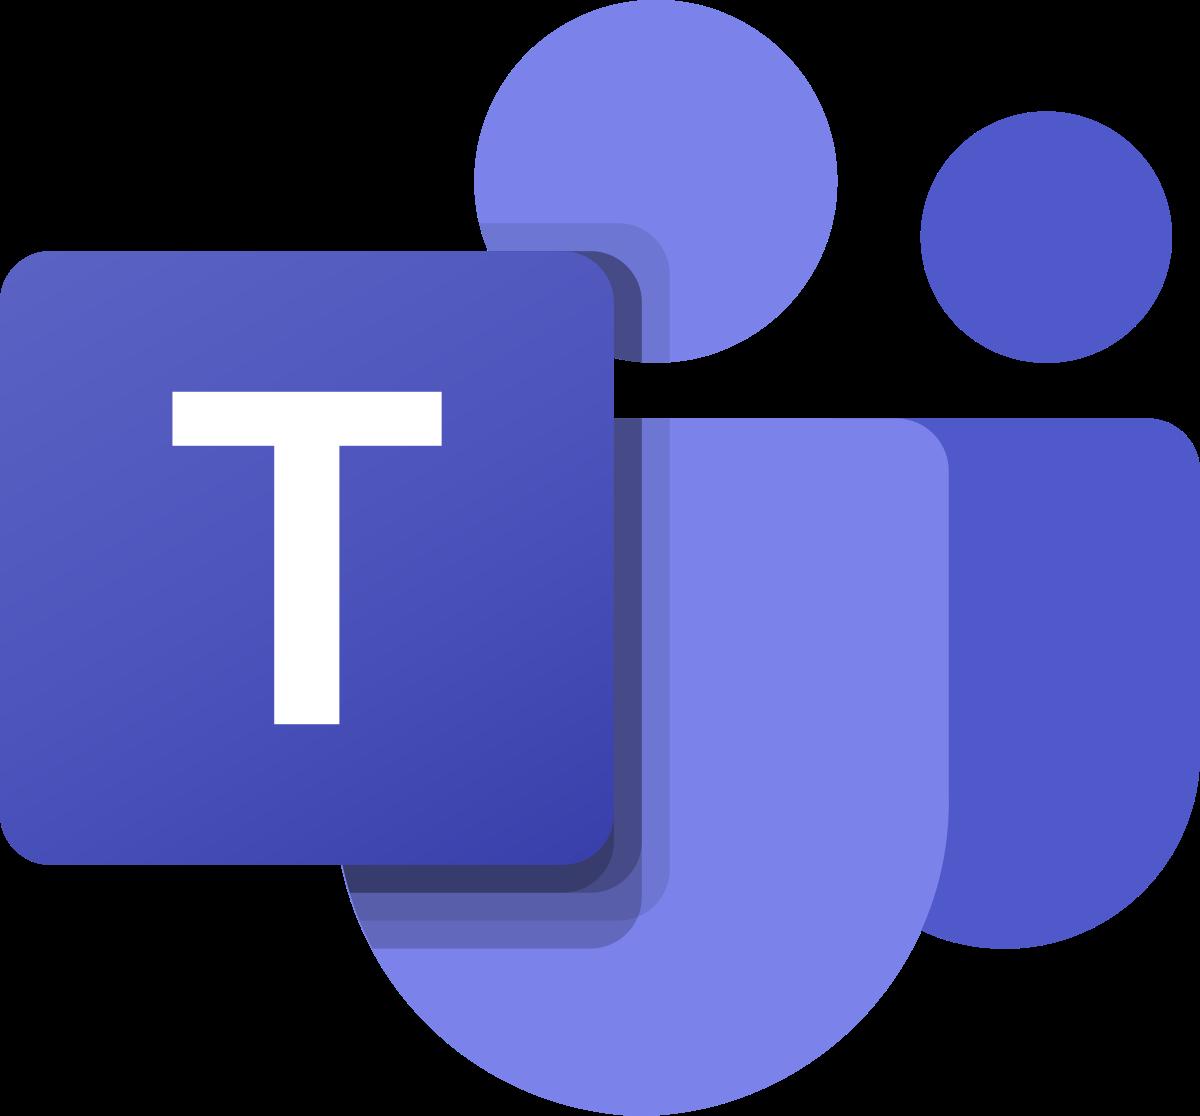 microsft-team-logo